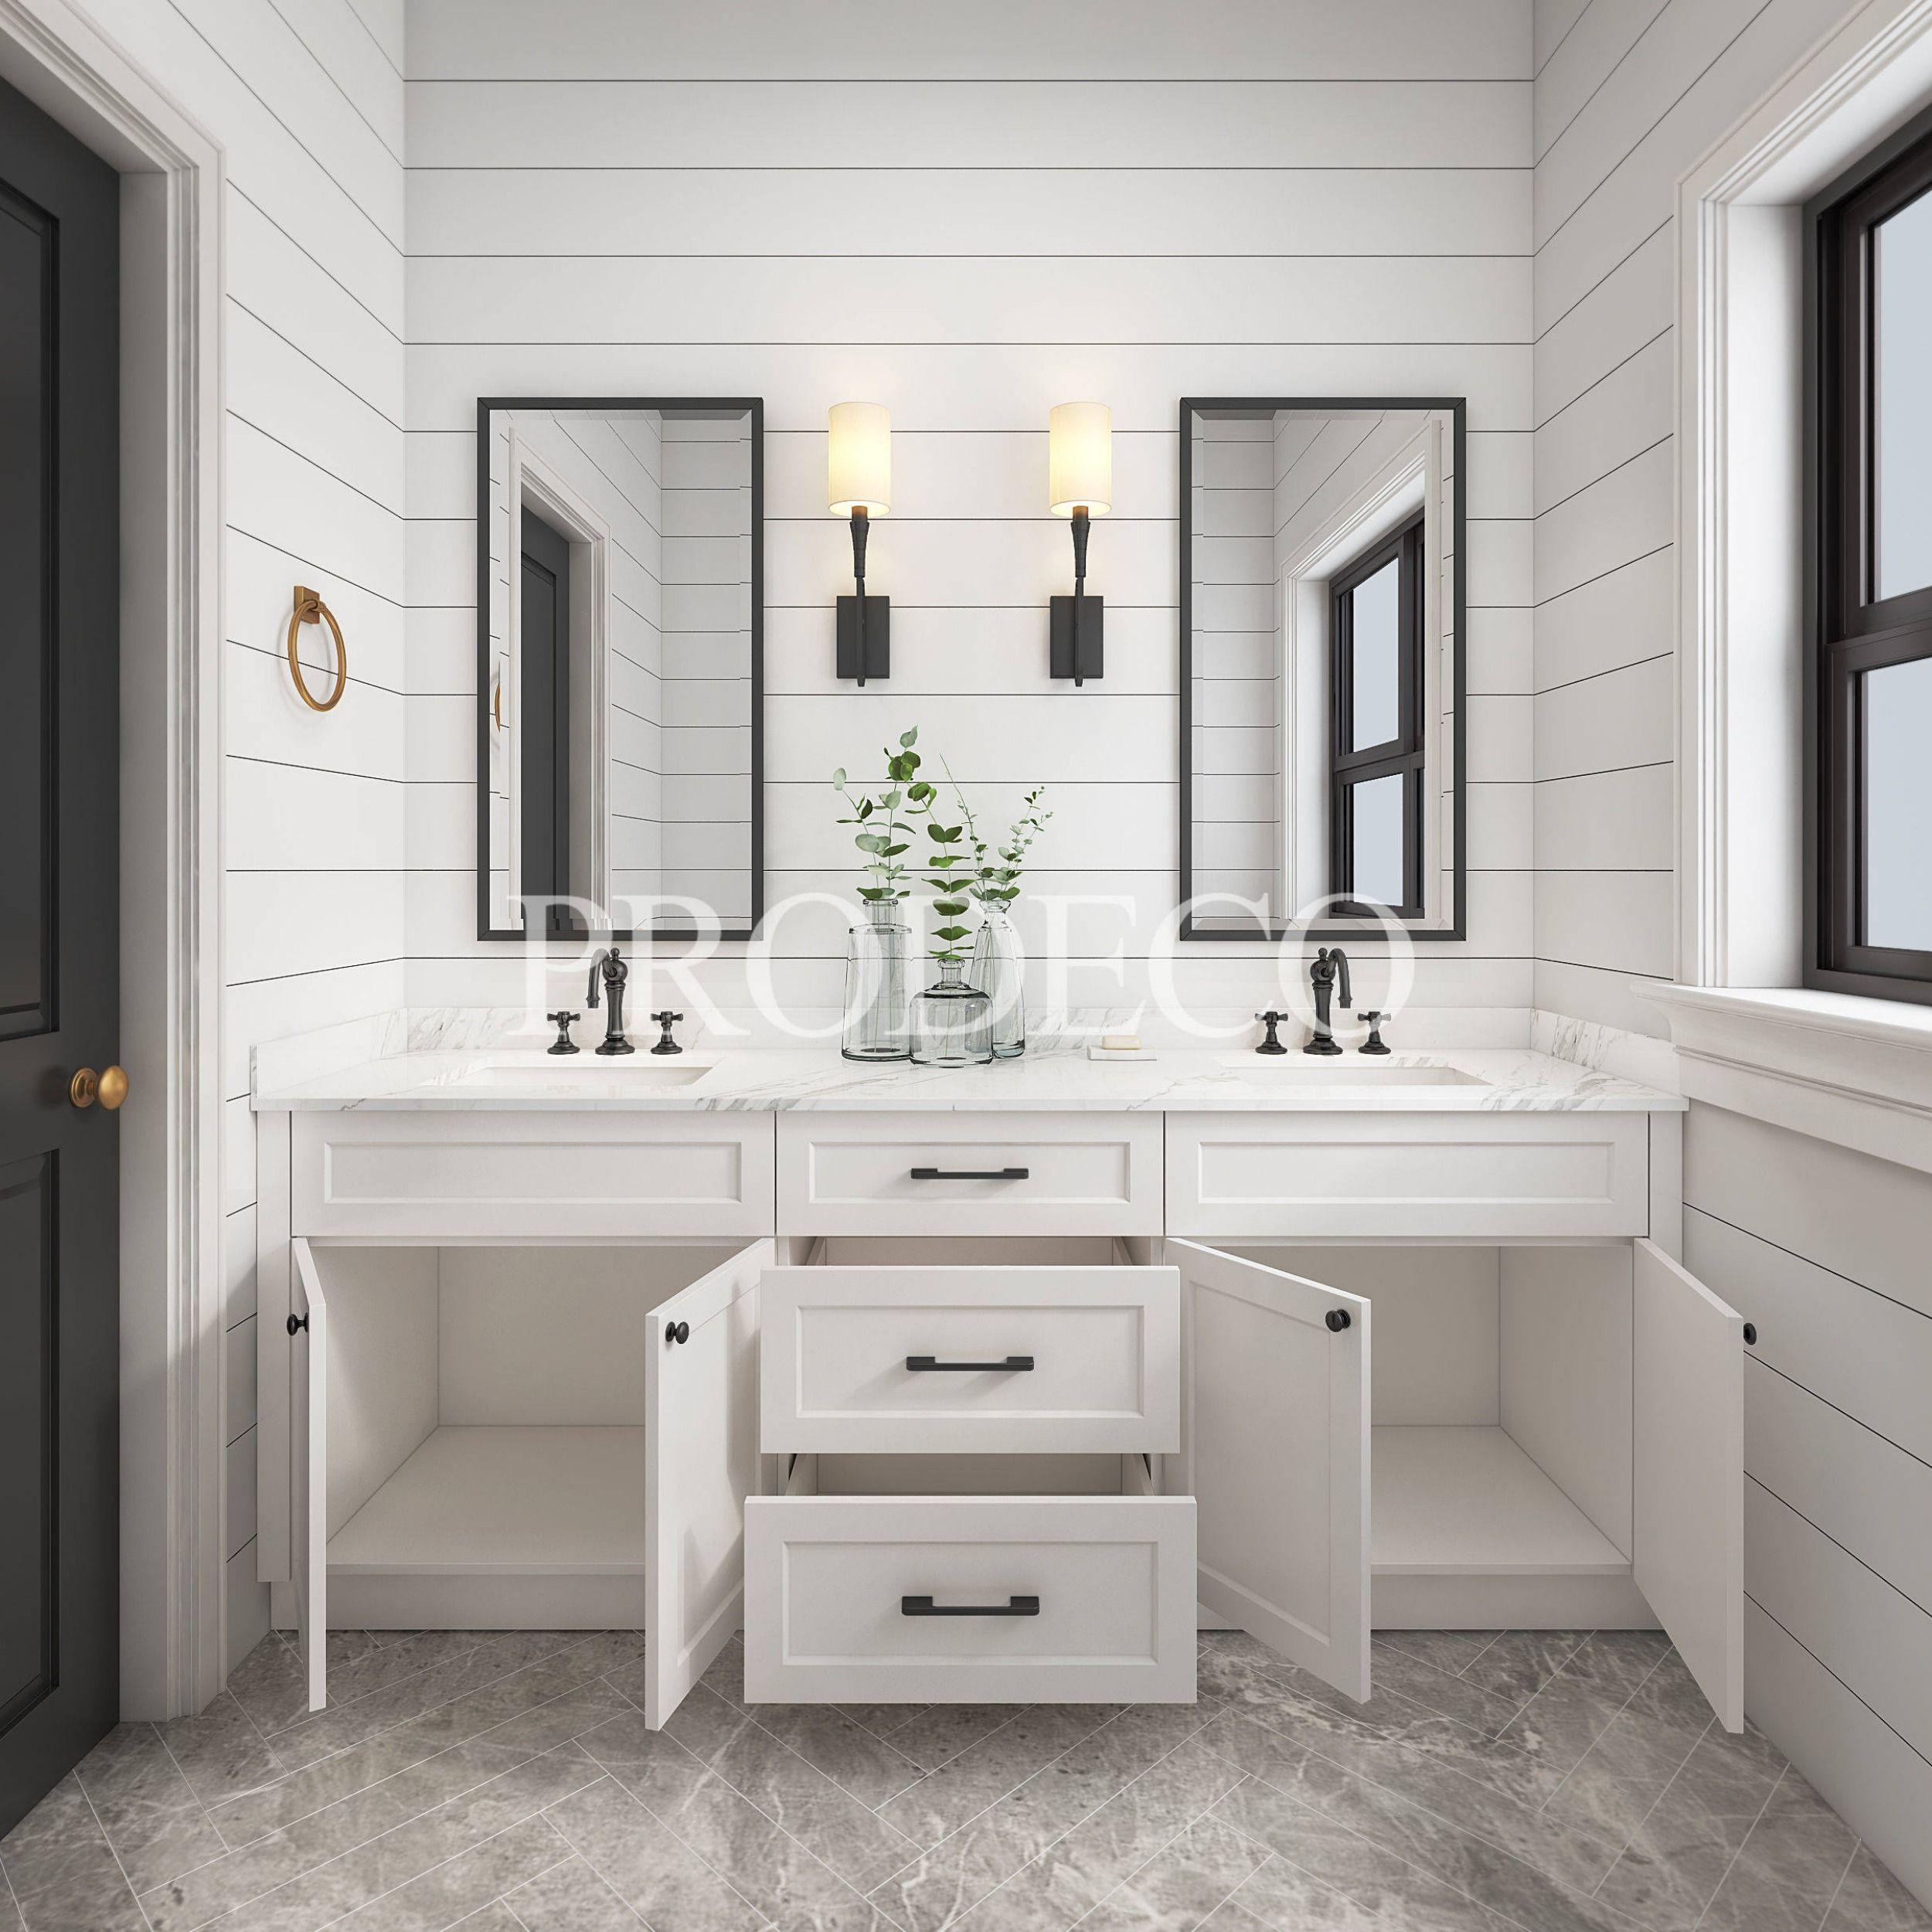 New Modern Design Shaker Style Bathroom Vanity Bathroom Styling Modern Bathroom Vanity Rustic Master Bathroom